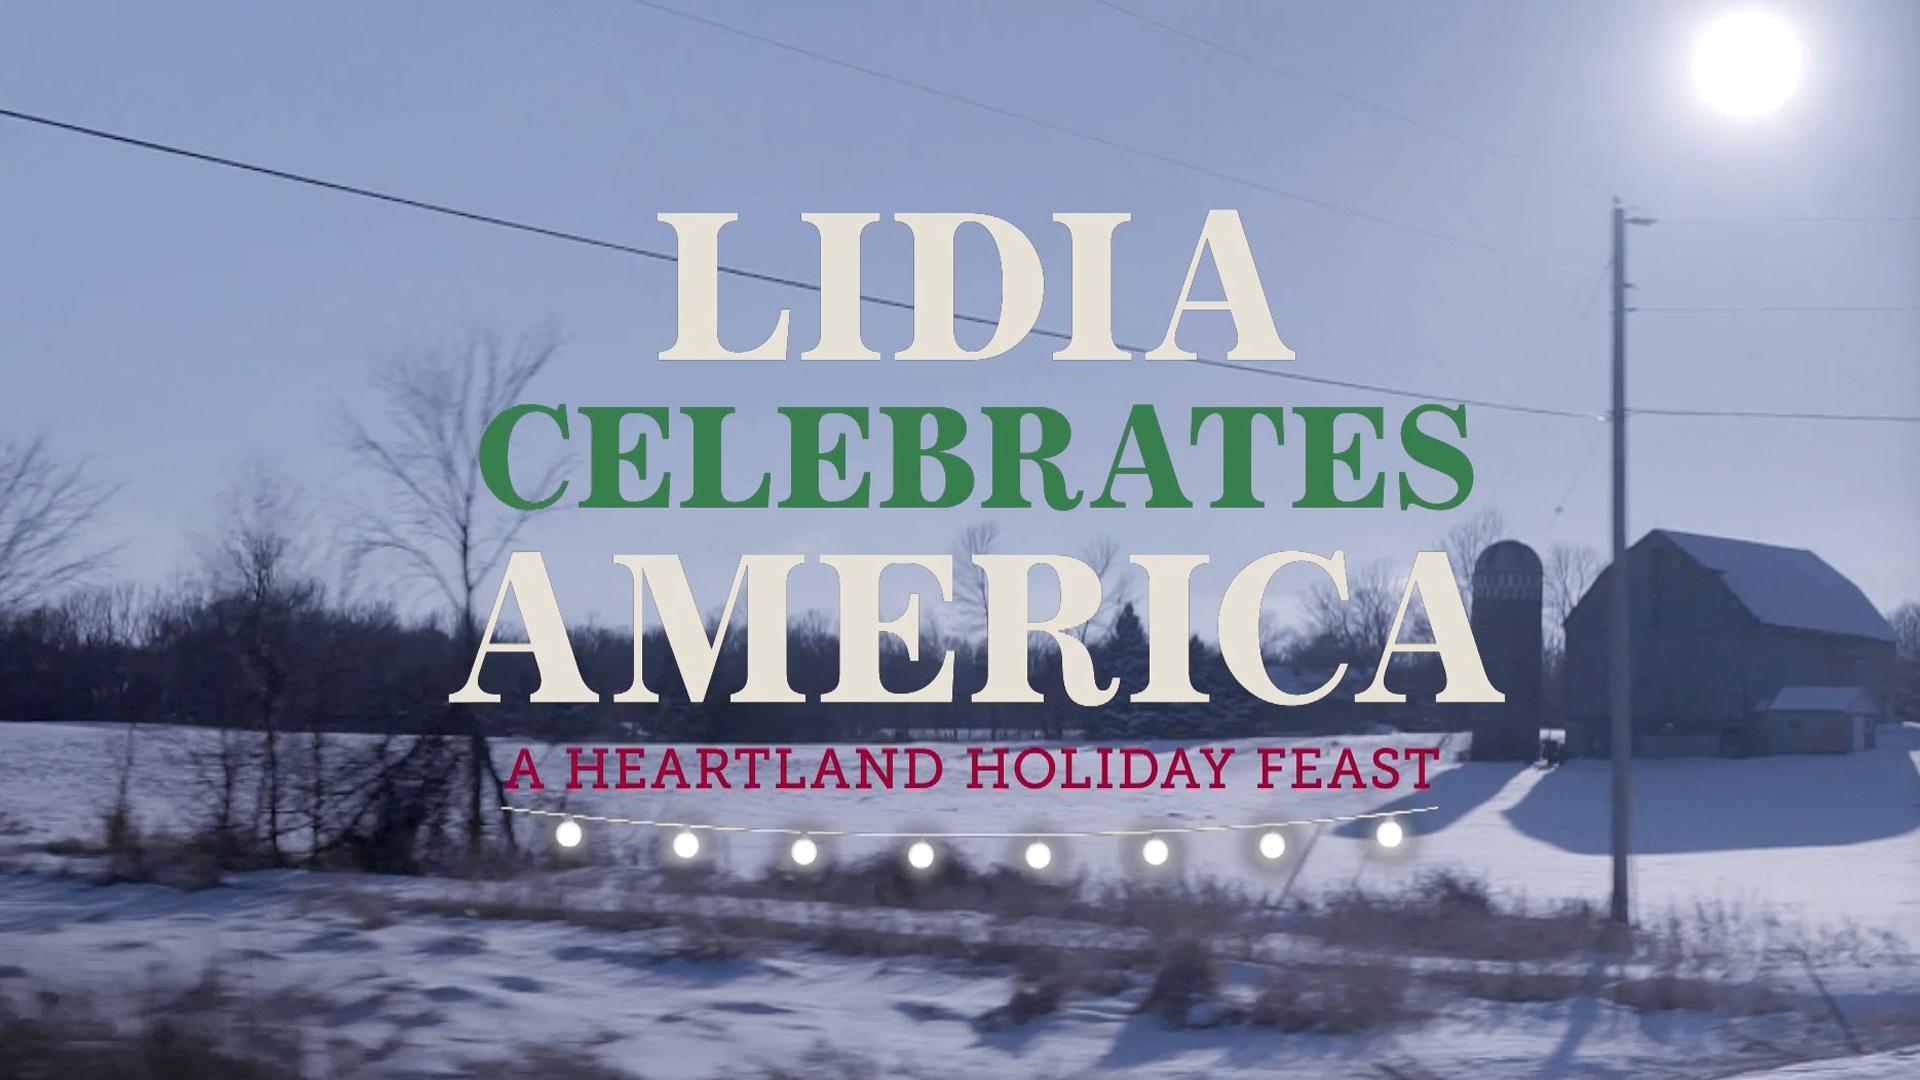 A Heartland Holiday Feast